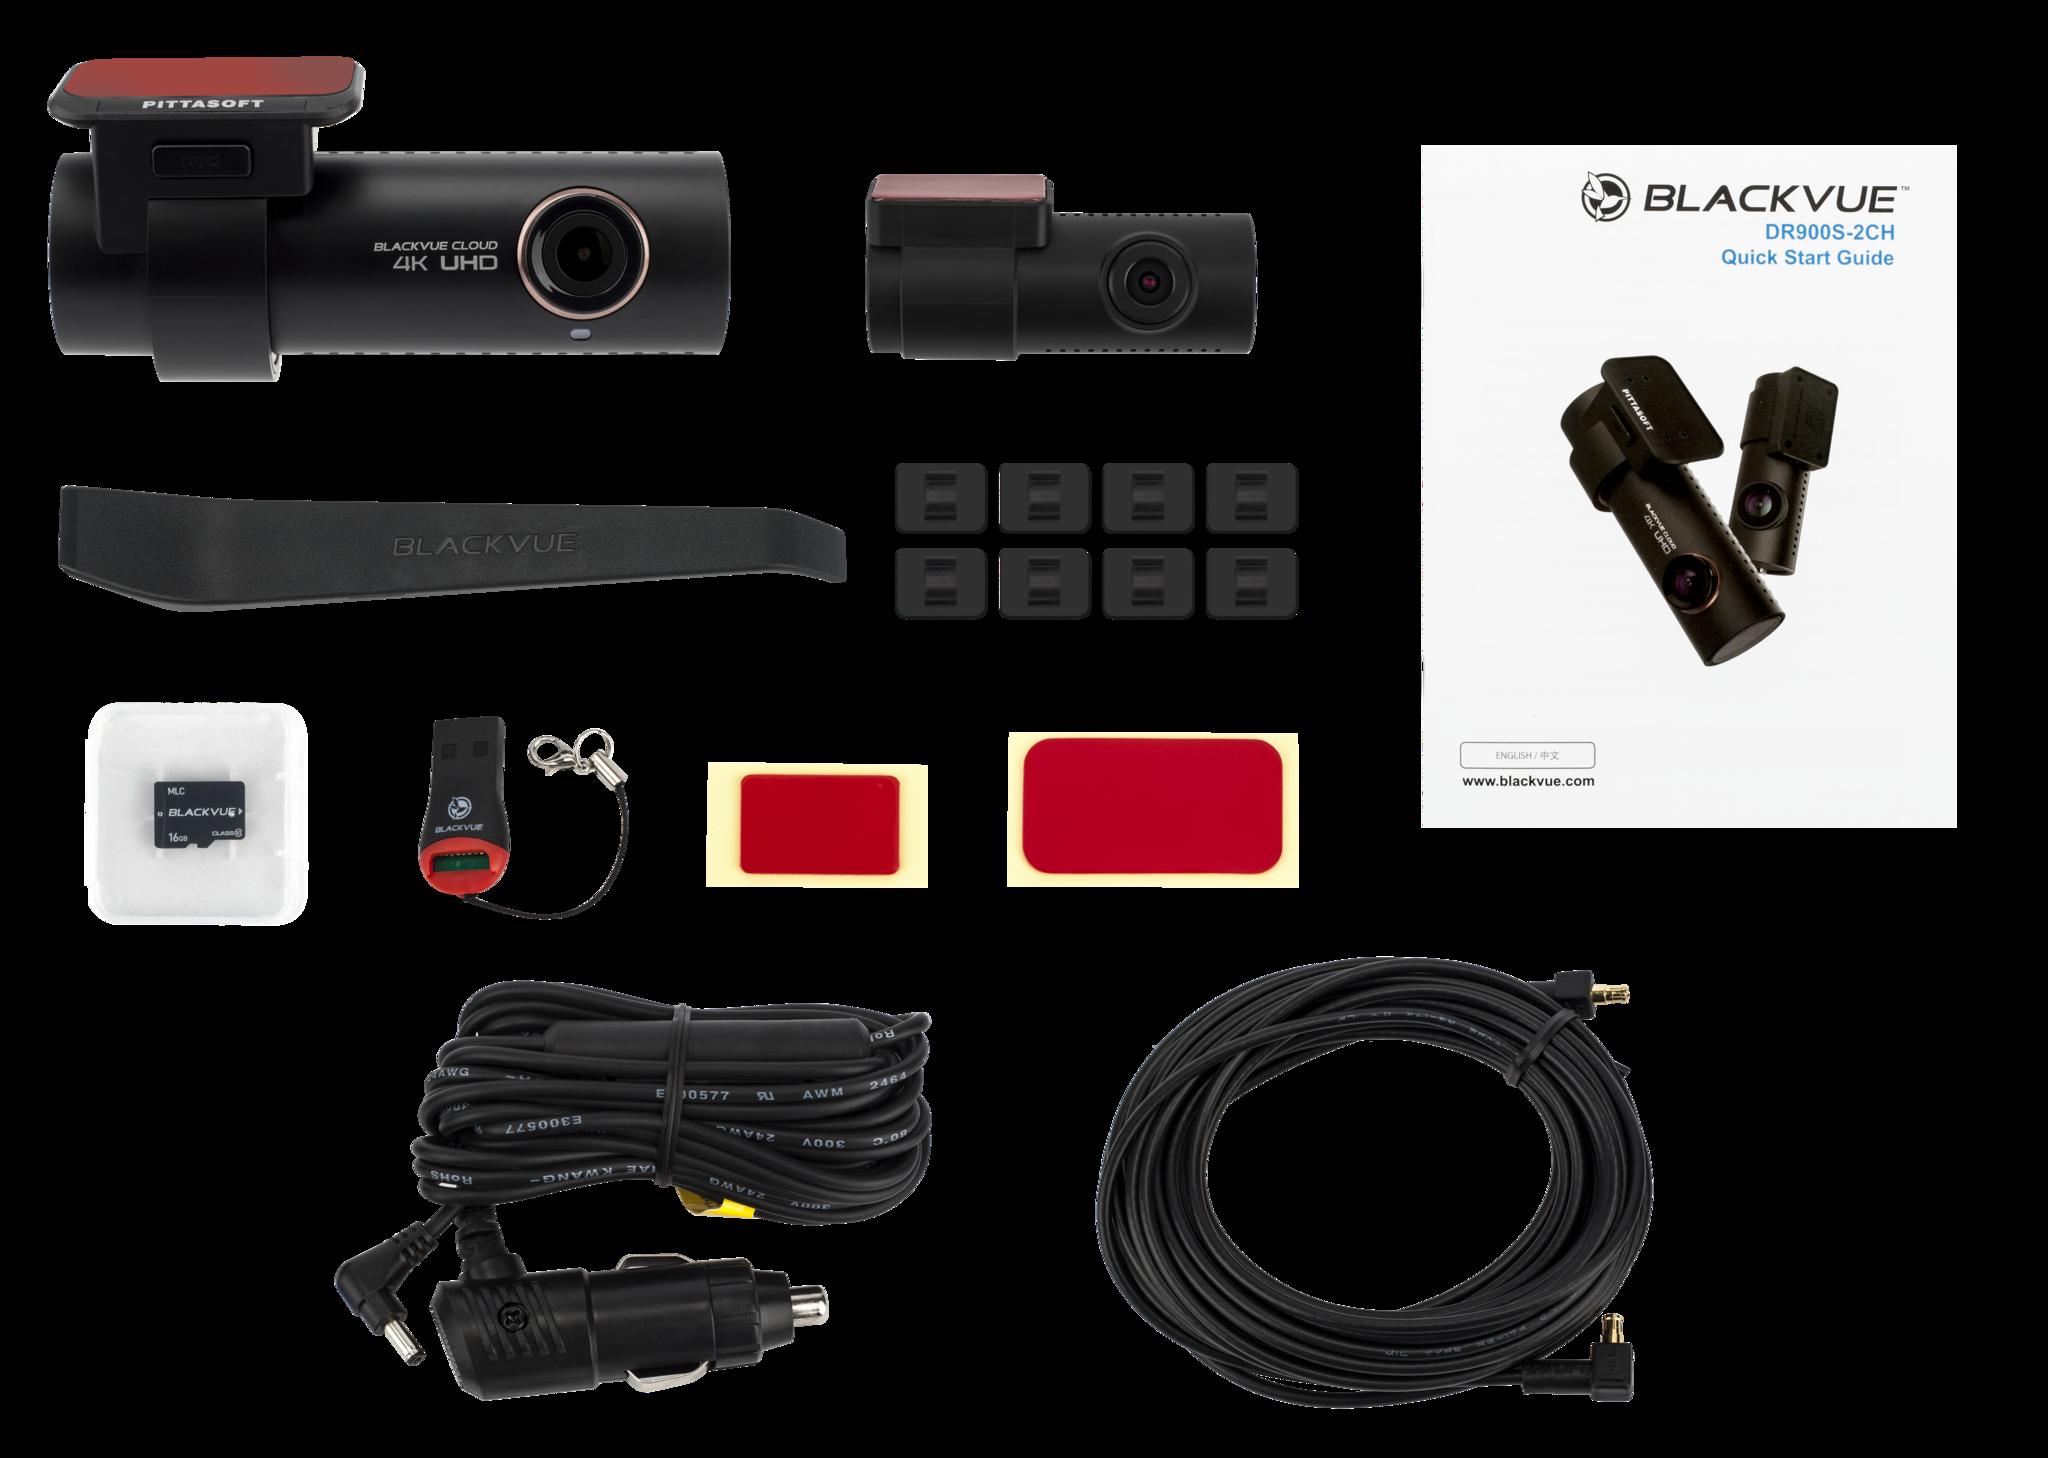 images-products-1-1431-232990103-DR900S-2CH_pkg.png